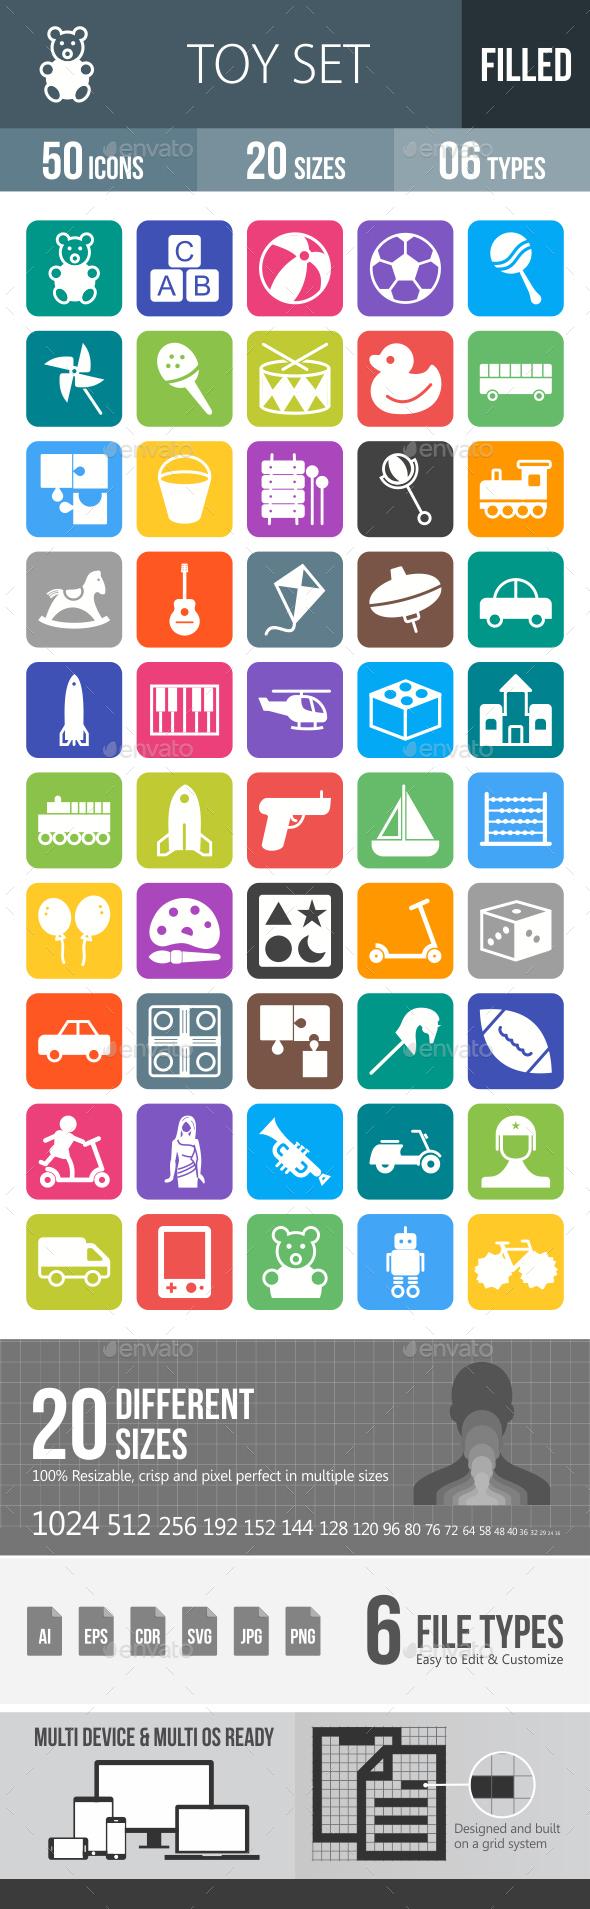 50 Toy Set Filled Round Corner Icons - Icons